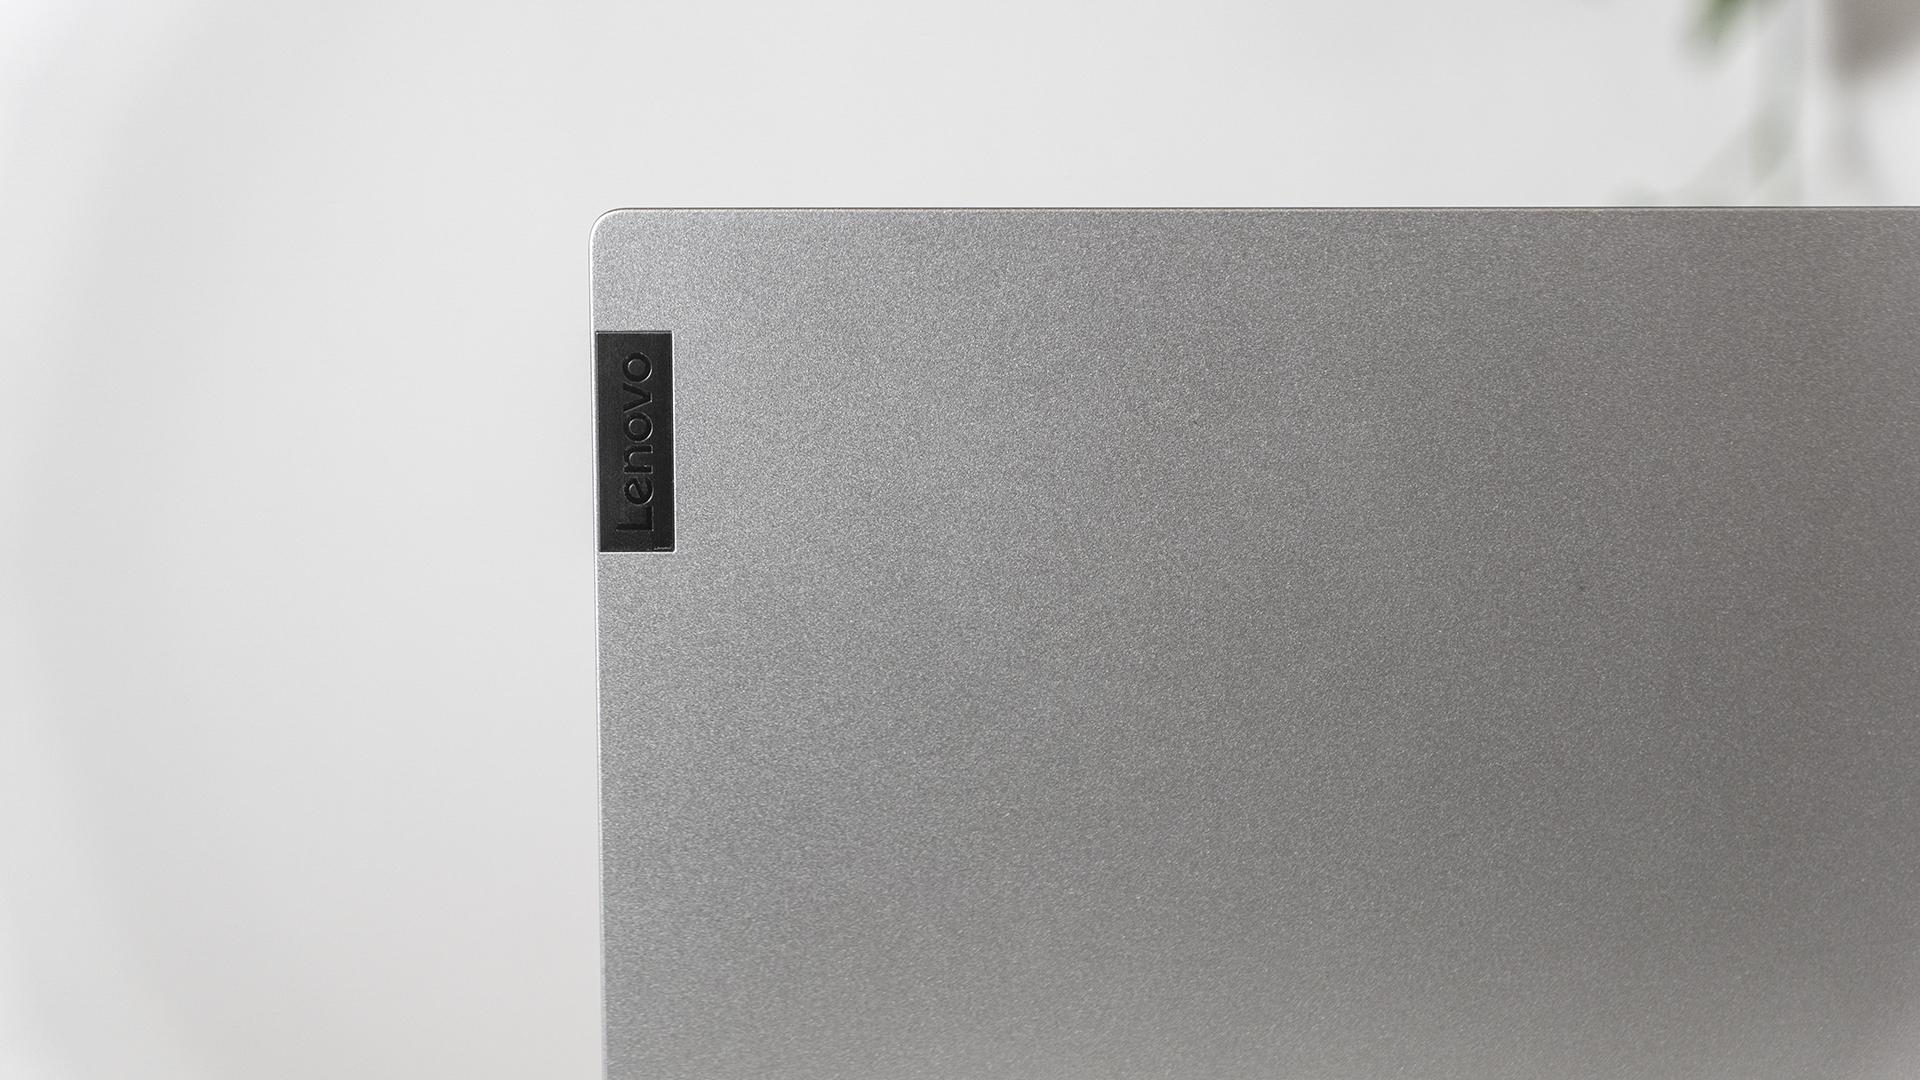 Lenovo IdeaPad Flex 5 Logo Detail